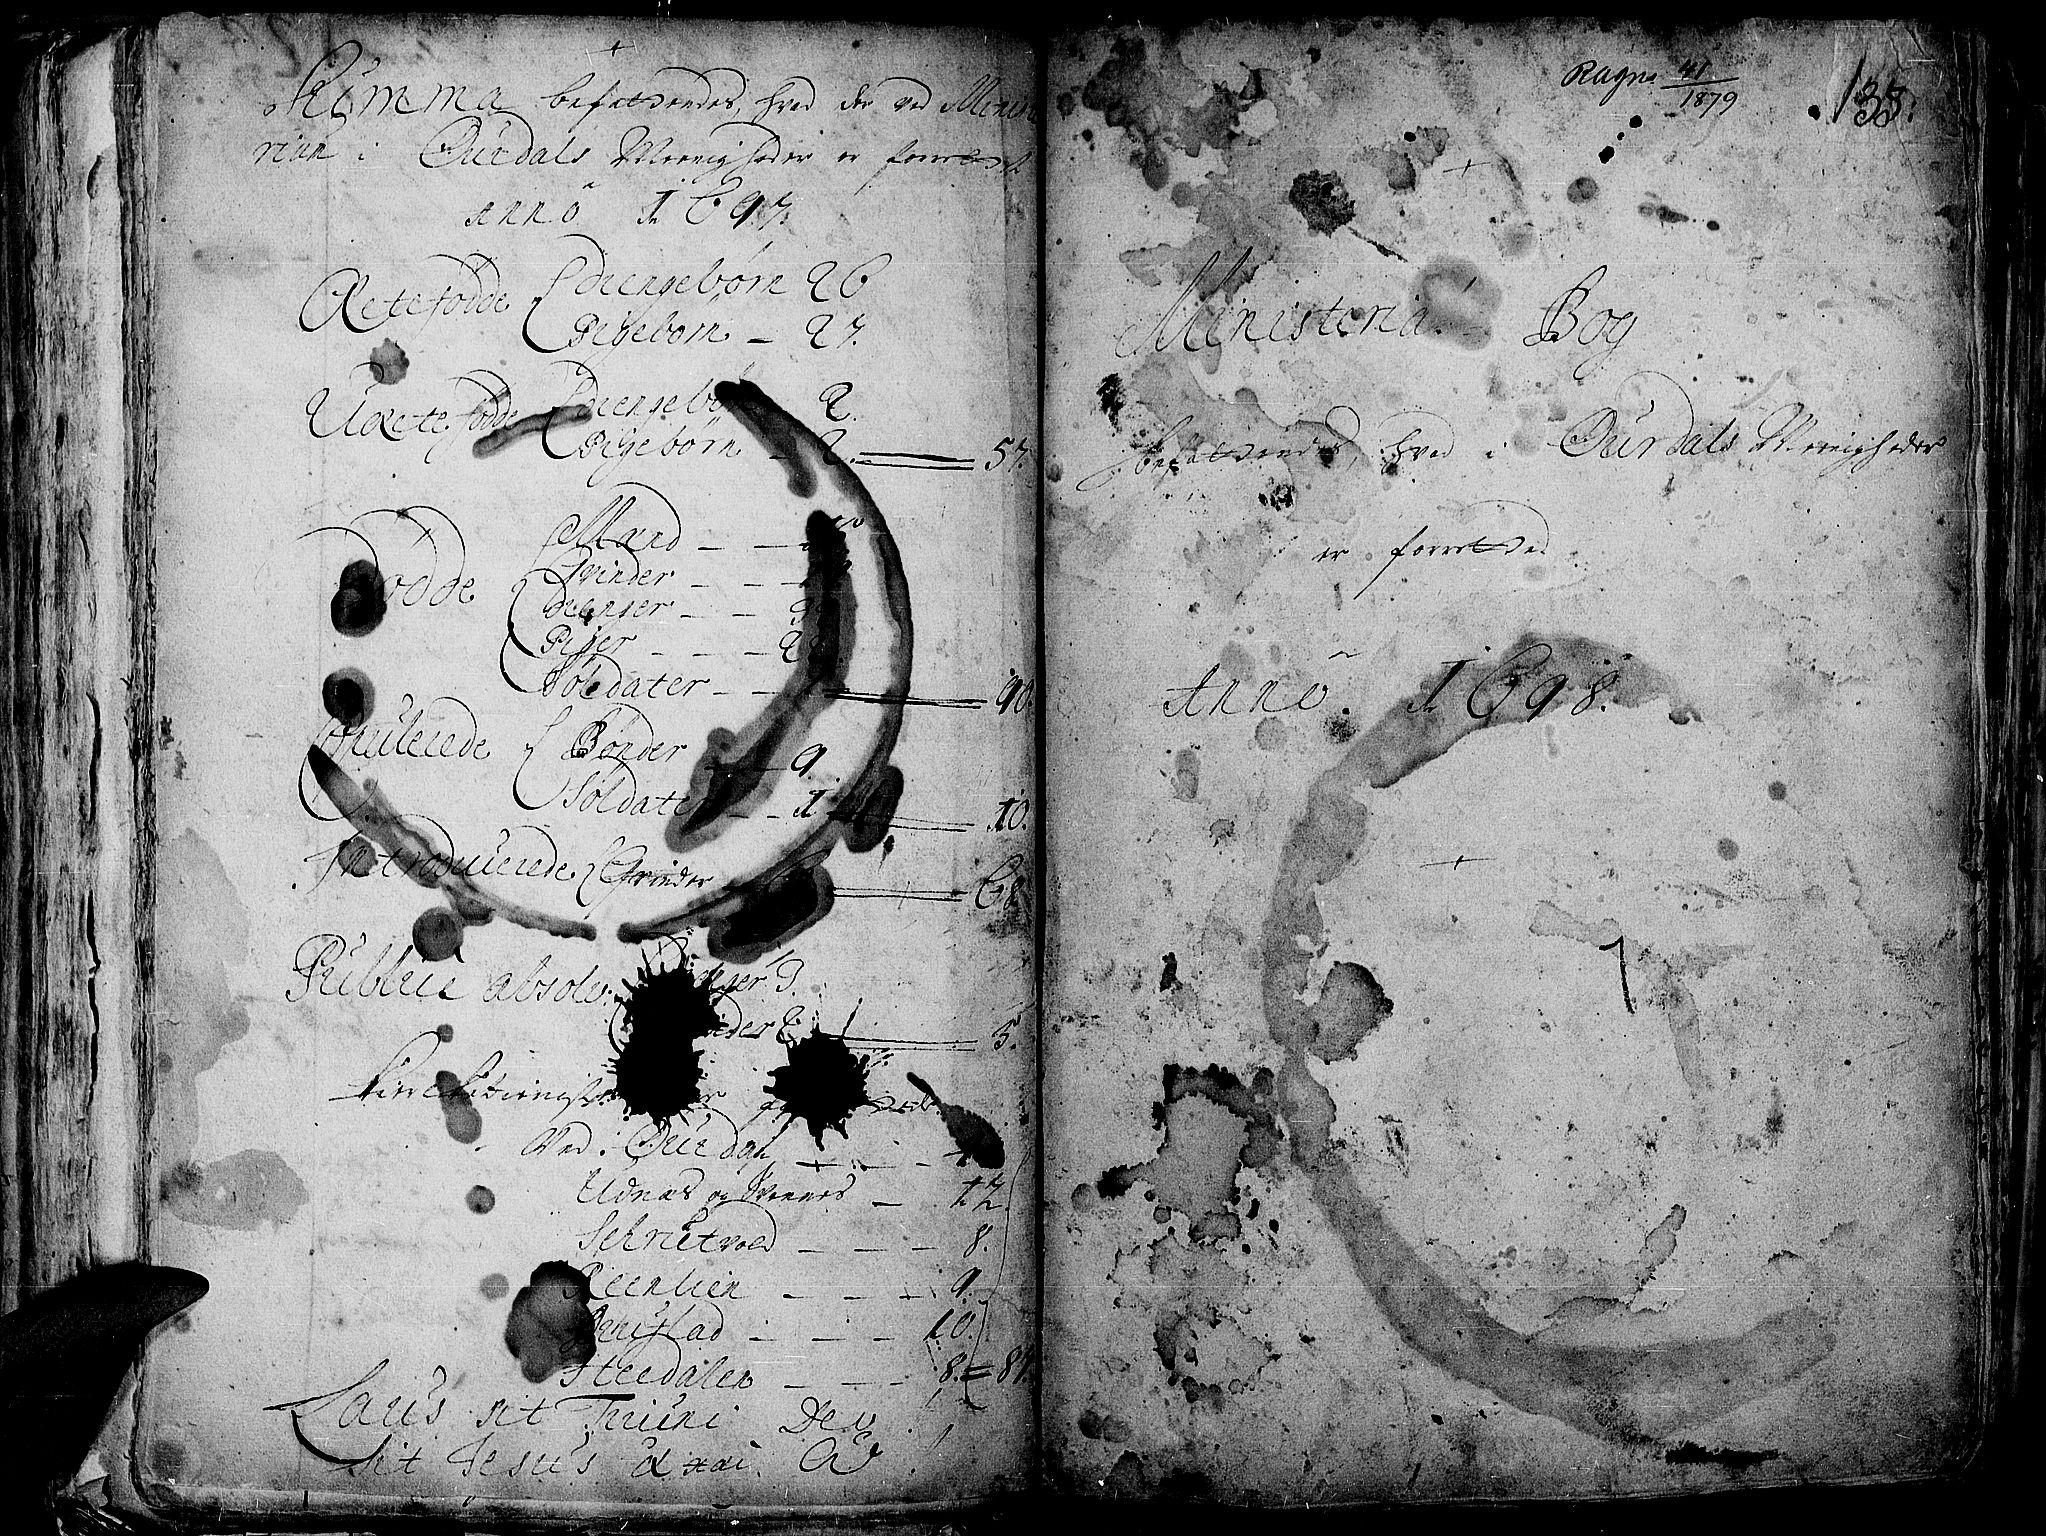 SAH, Aurdal prestekontor, Ministerialbok nr. 1-3, 1692-1730, s. 135